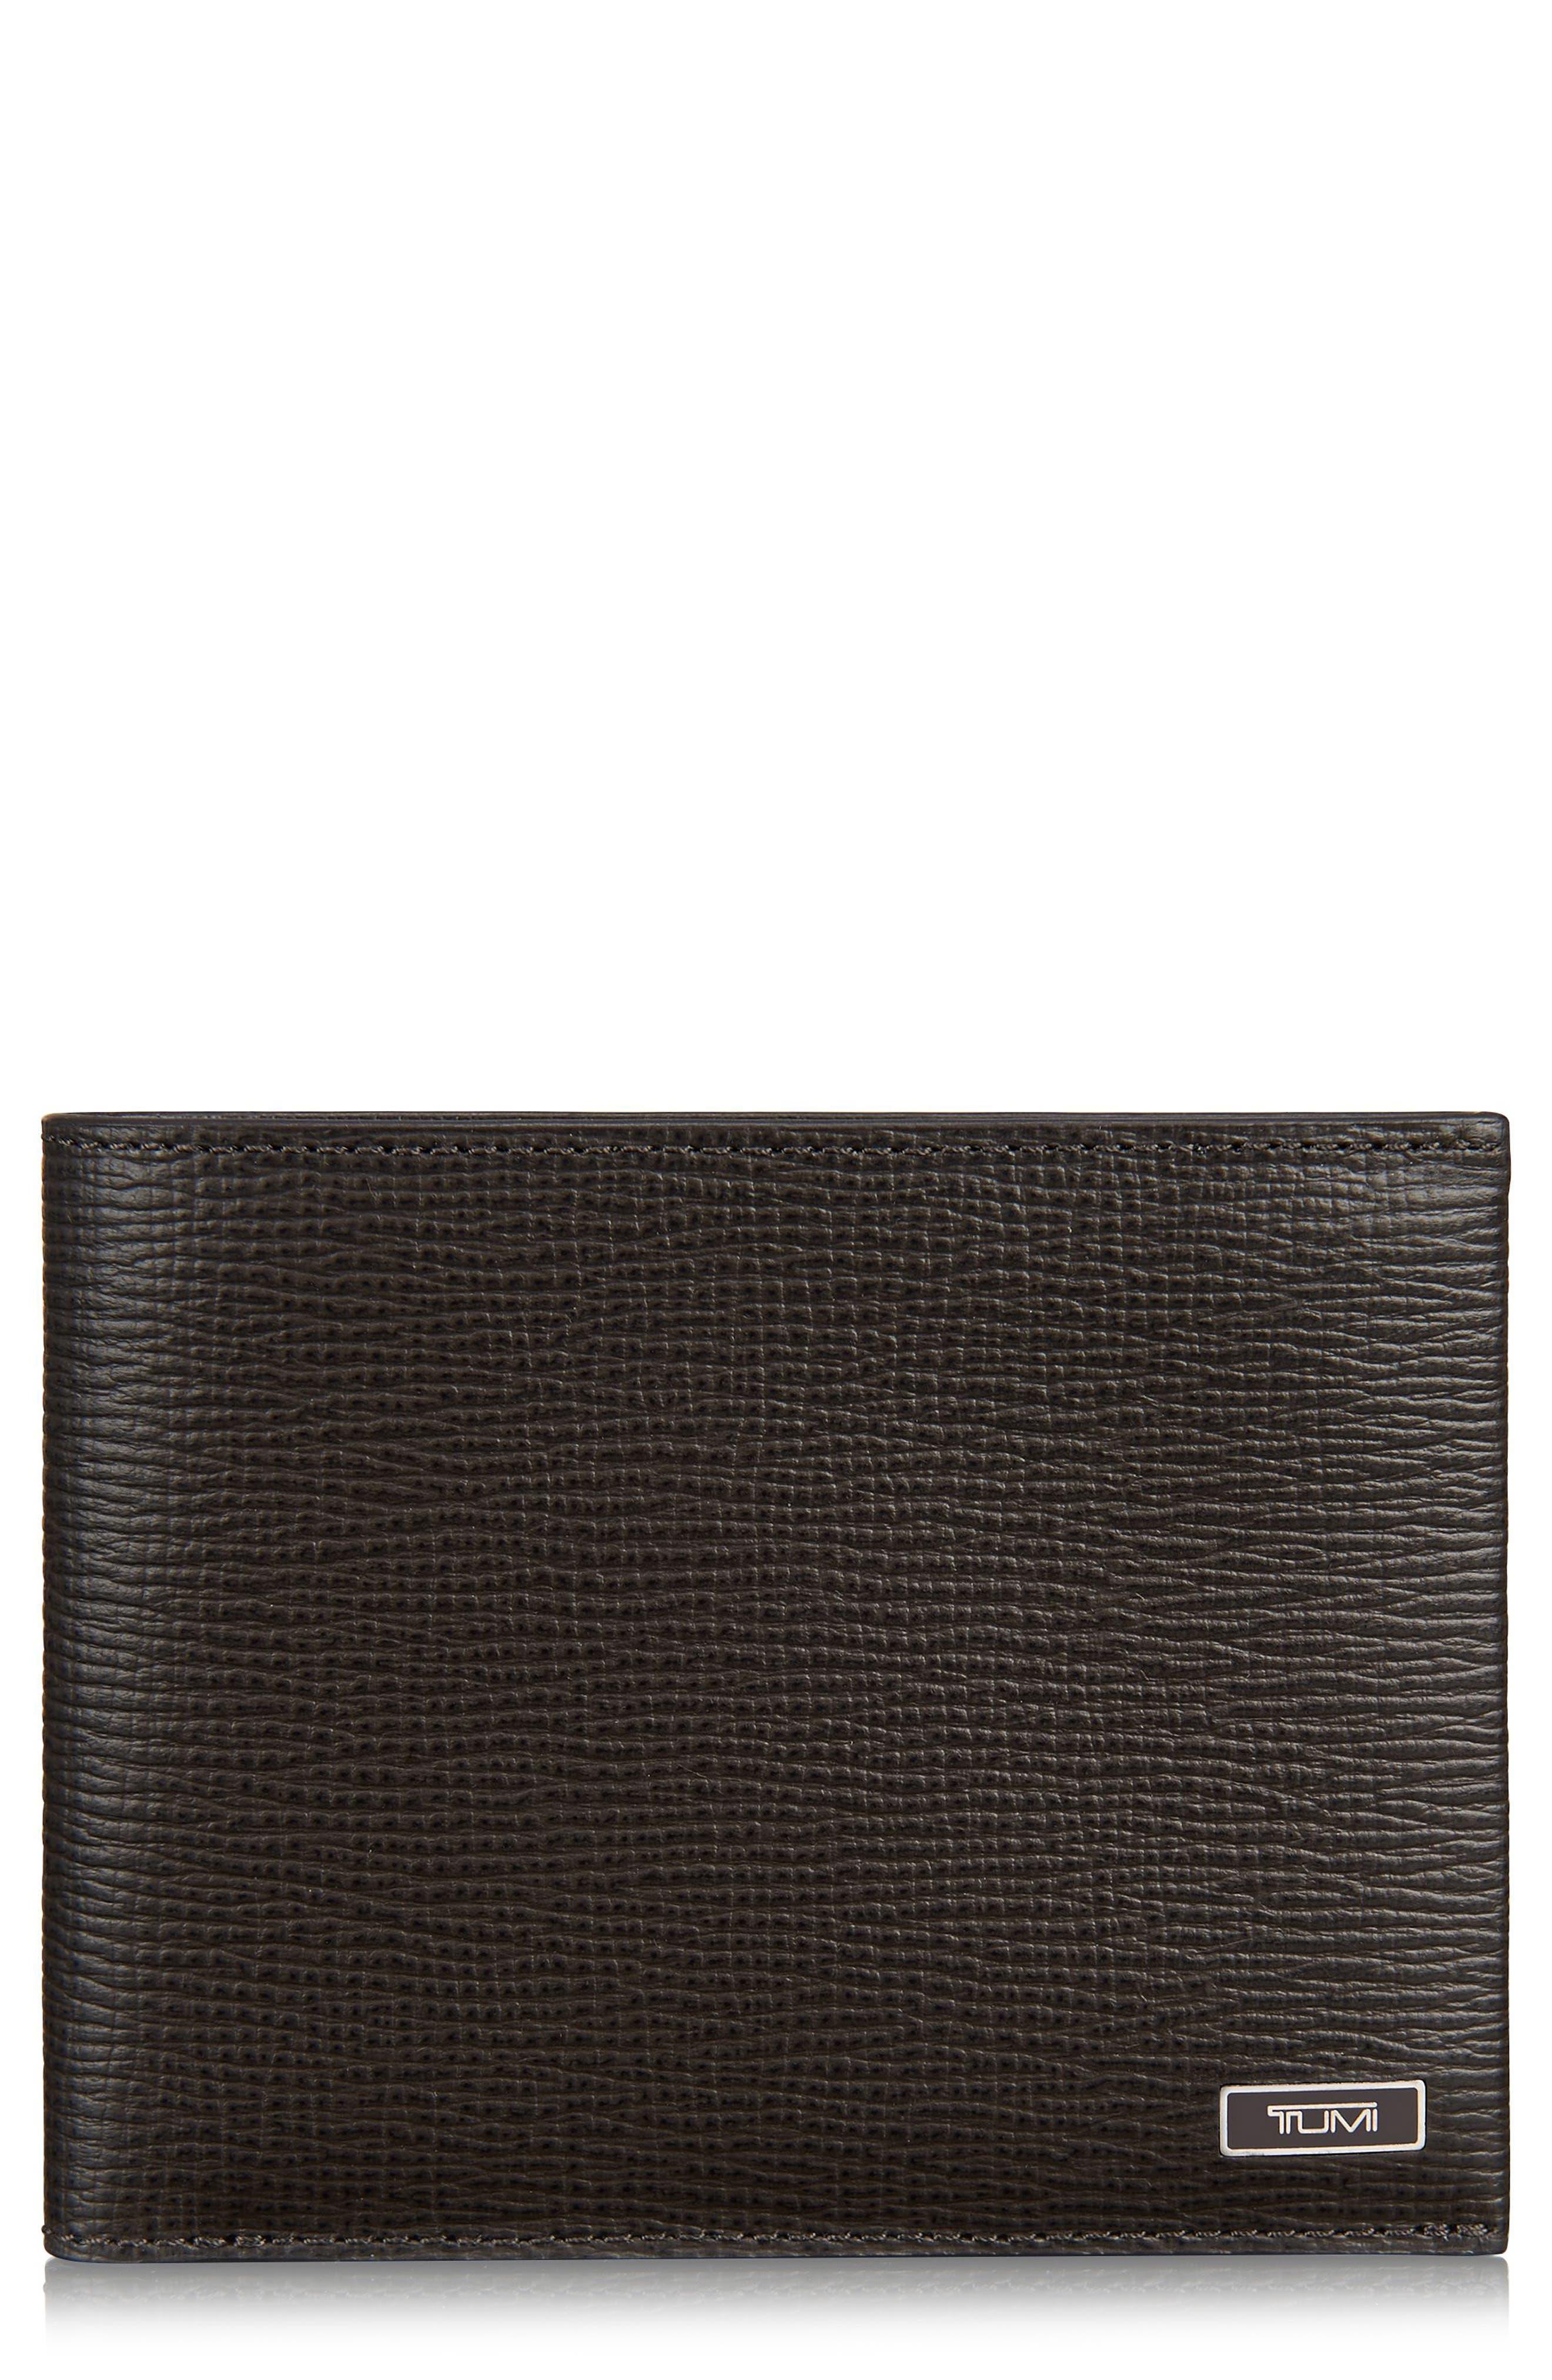 Main Image - Tumi Monaco Leather Wallet